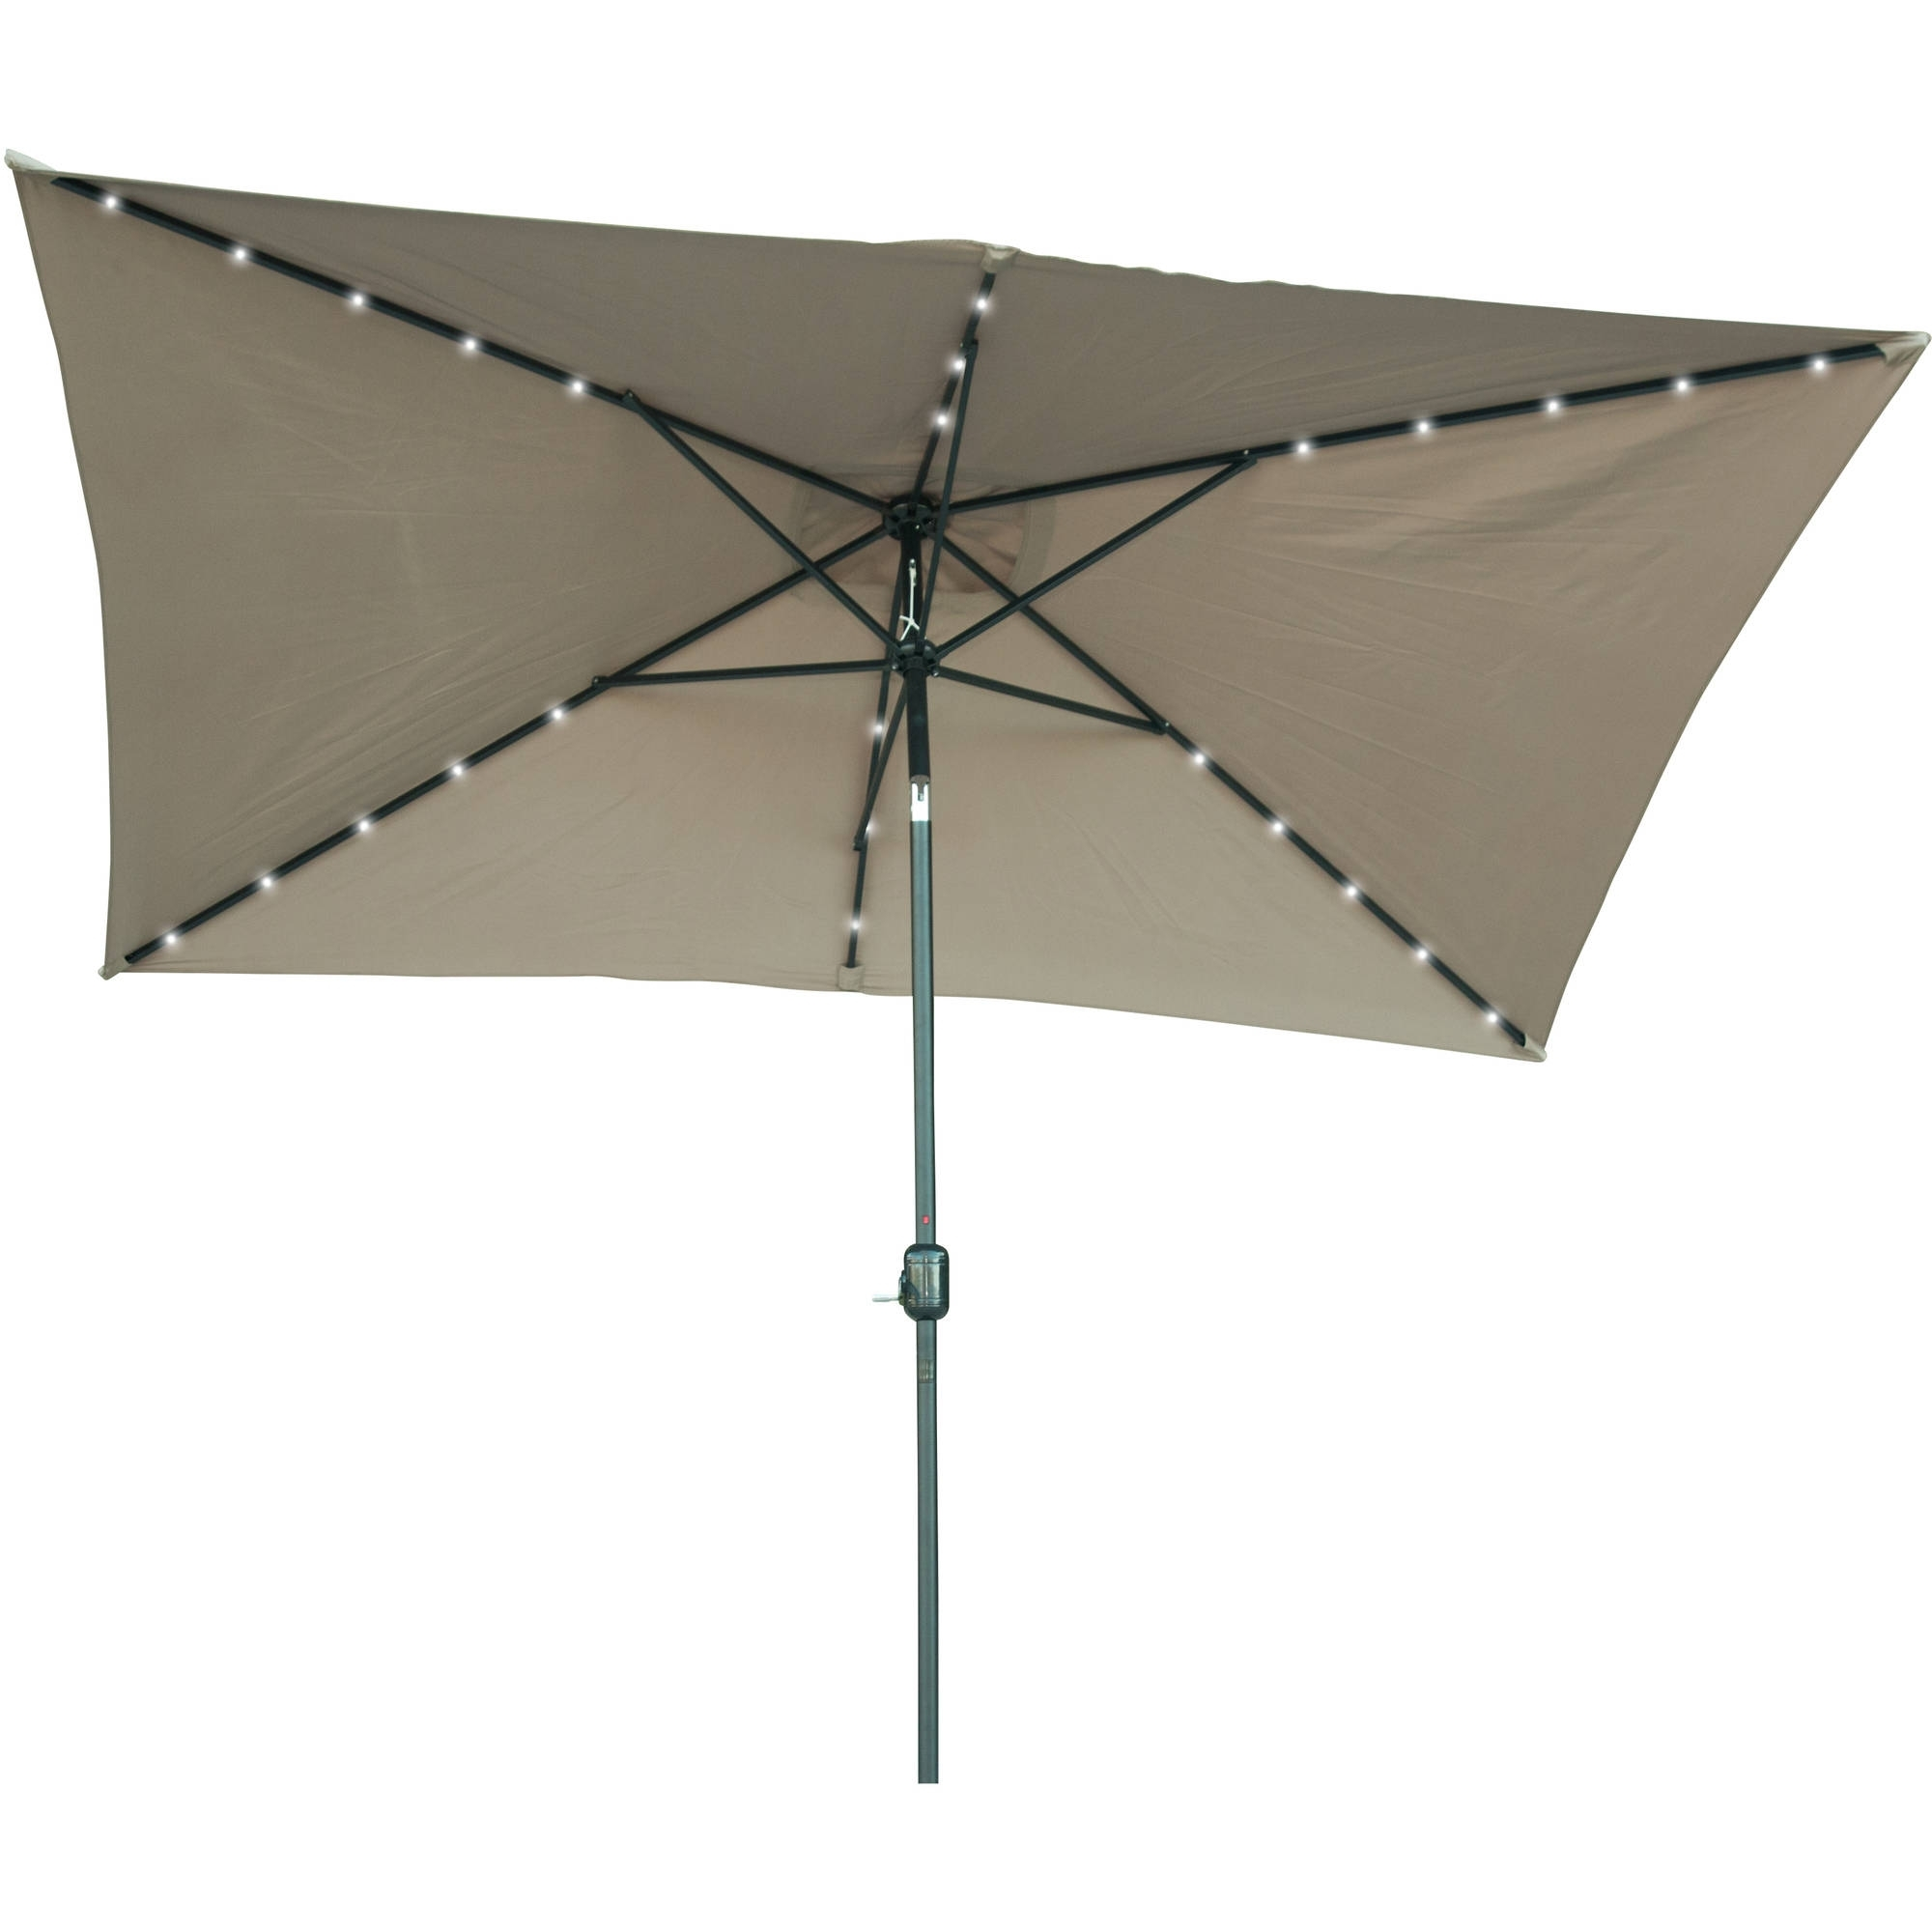 Most Popular Lighted Patio Umbrellas Pertaining To Rectangular Solar Powered Led Lighted Patio Umbrella – 10' X  (View 15 of 20)